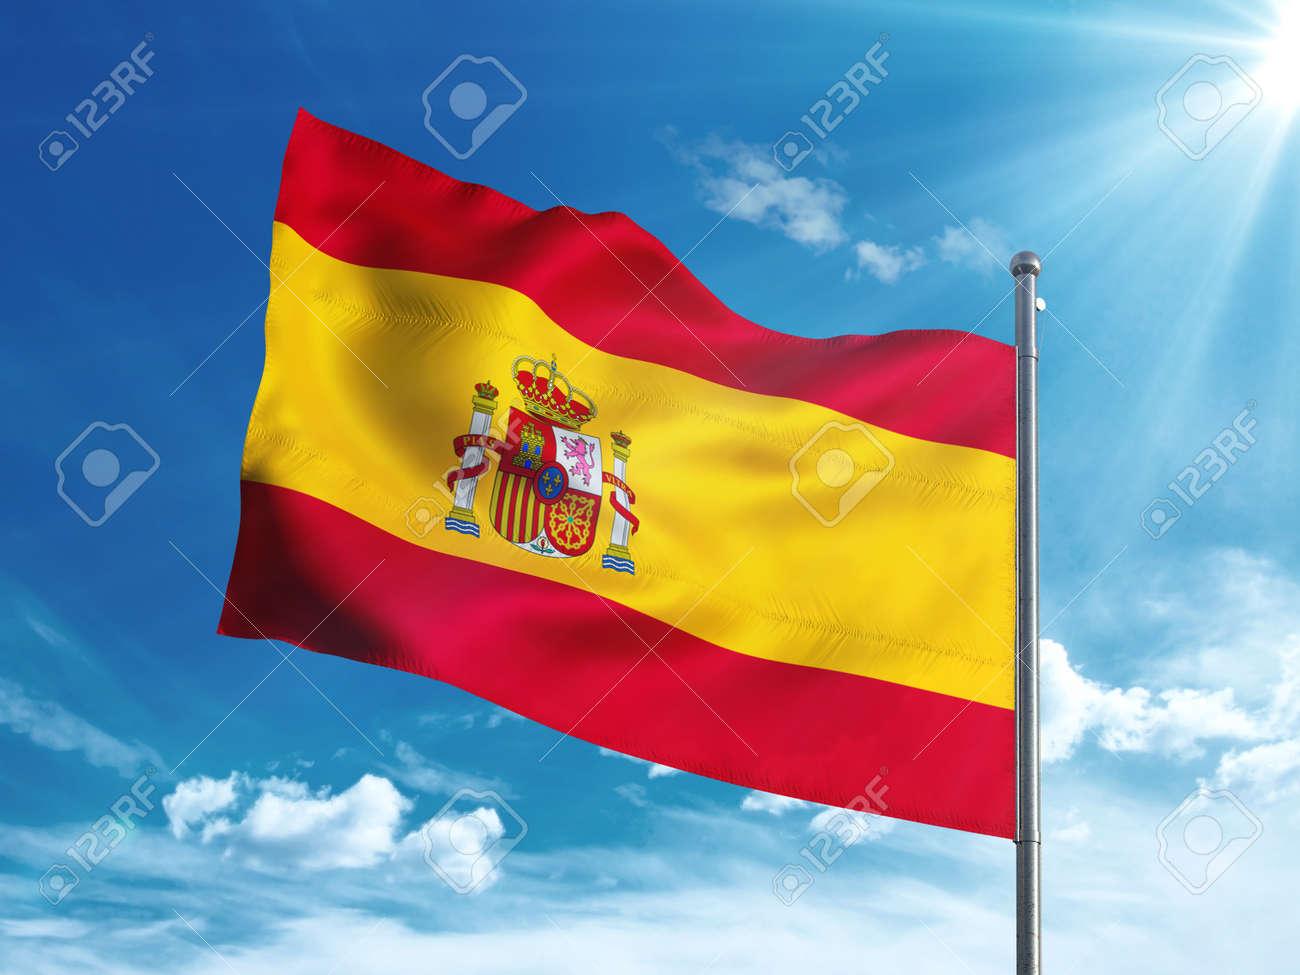 Spain flag waving in the blue sky - 82792164